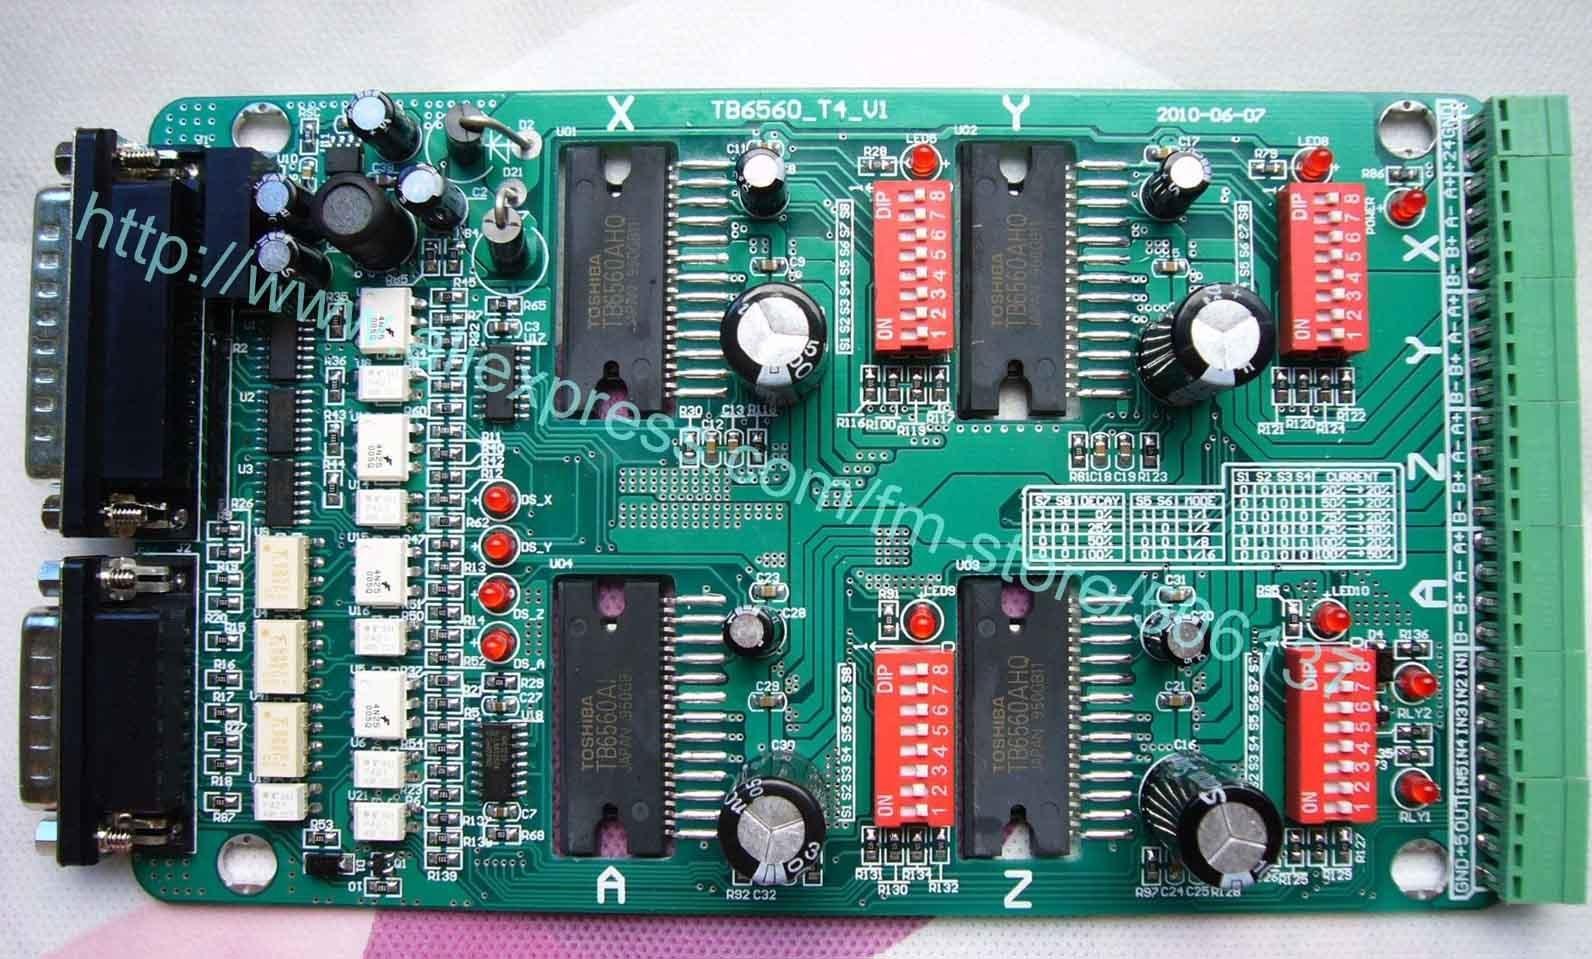 4 Axis TB6560 3.5A Stepper Motor Driver M335-4T,TB6560-T4 CNC Driver,4 axis stepper motor driver hot tb6560ahq ic tb6560 stepper driver toshiba chip sm003 cf